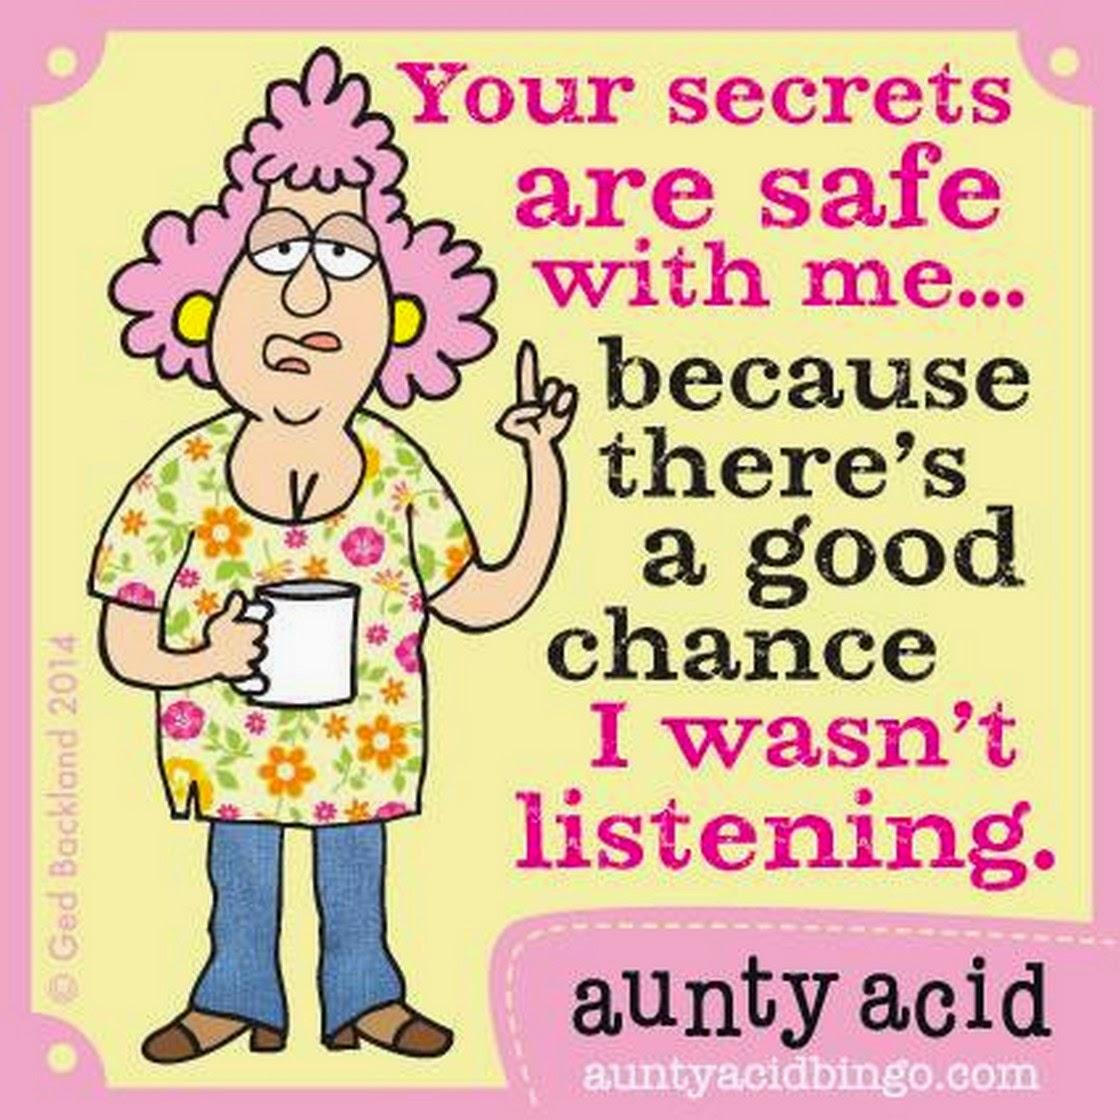 Chuck S Fun Page 2 Sporting Some Maxine: Chuck's Fun Page 2: Fifteen Aunty Acid Cartoons (you Can